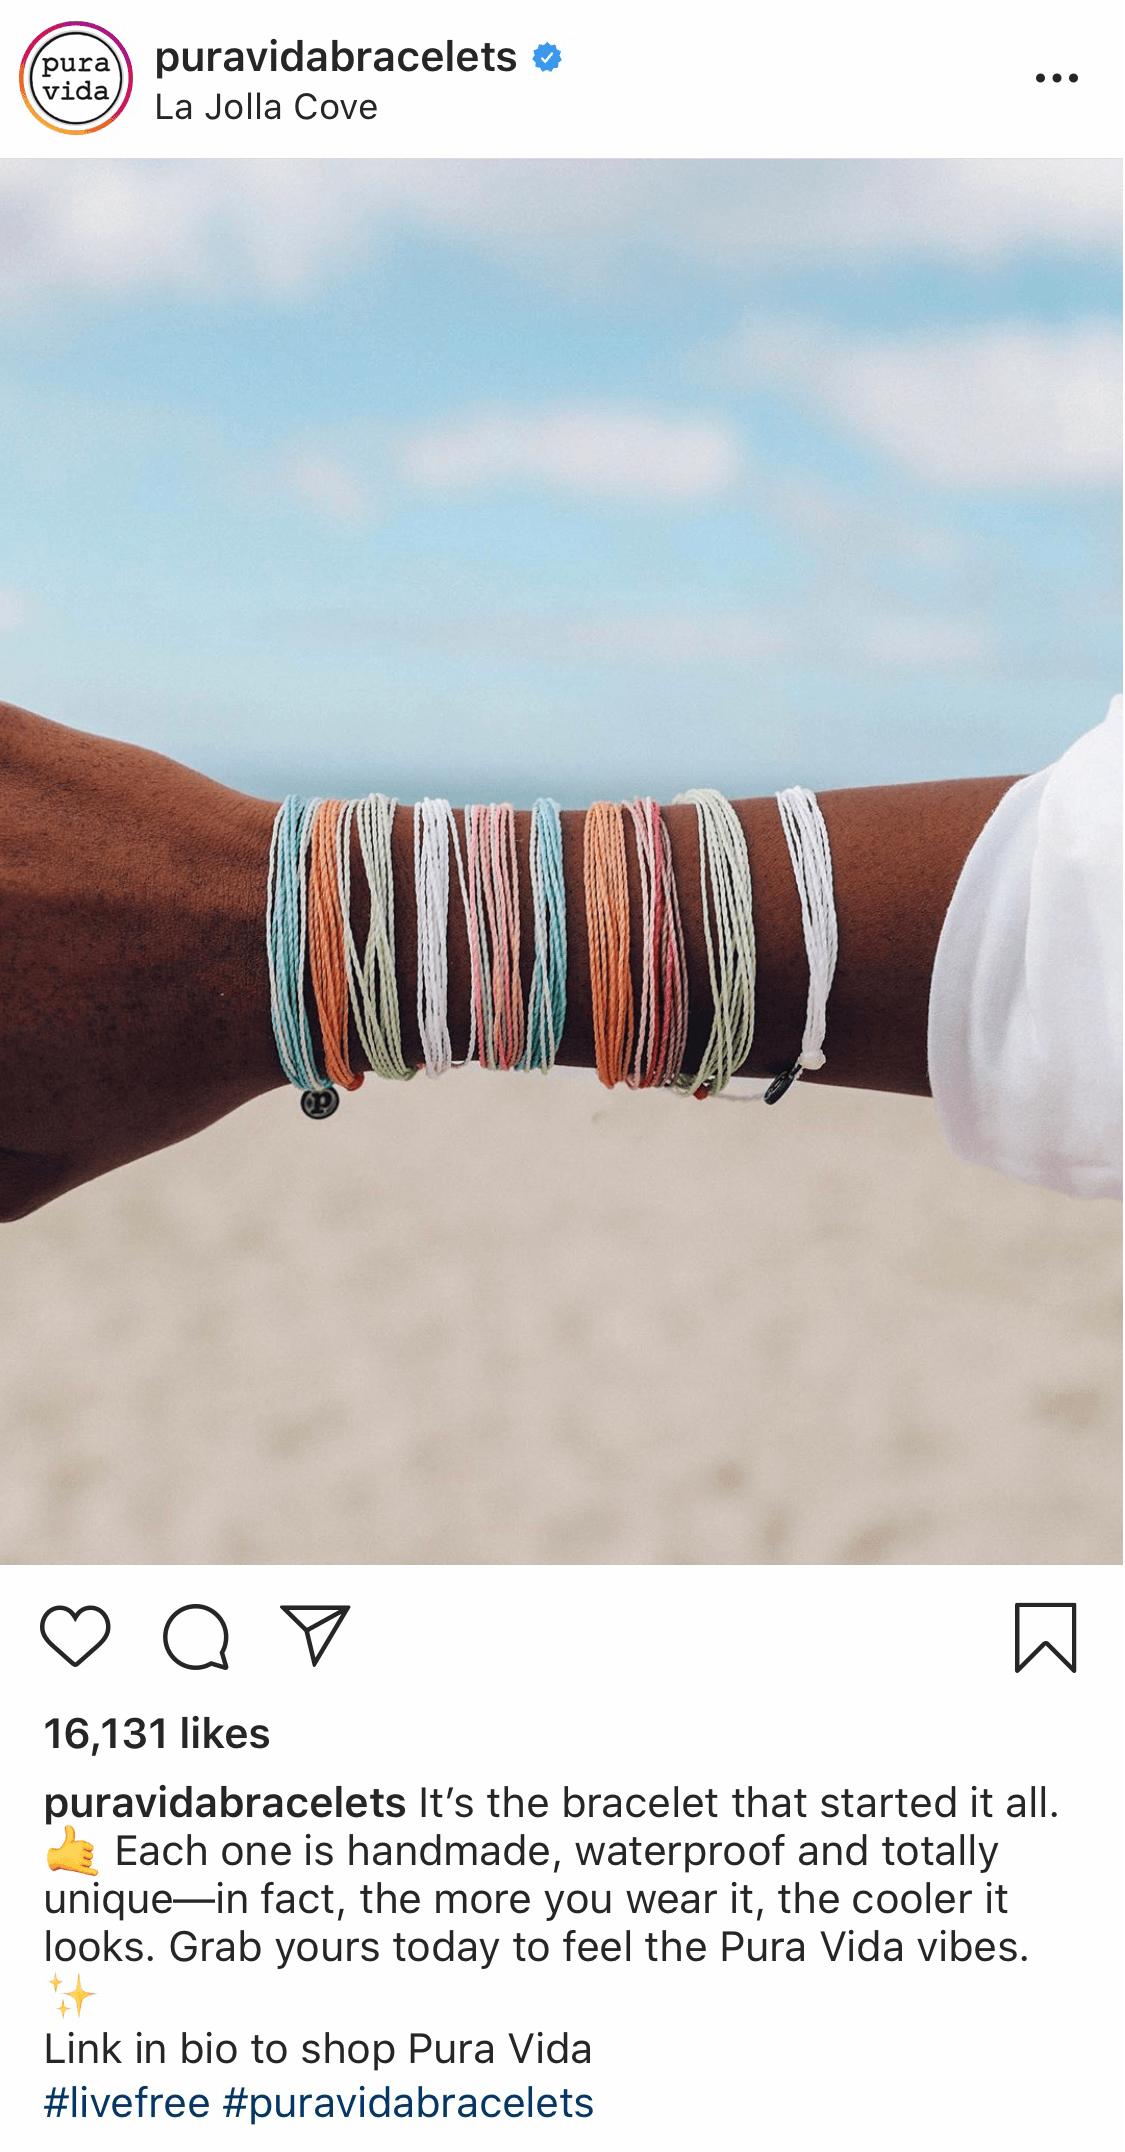 Instagram post by @puravidabracelets